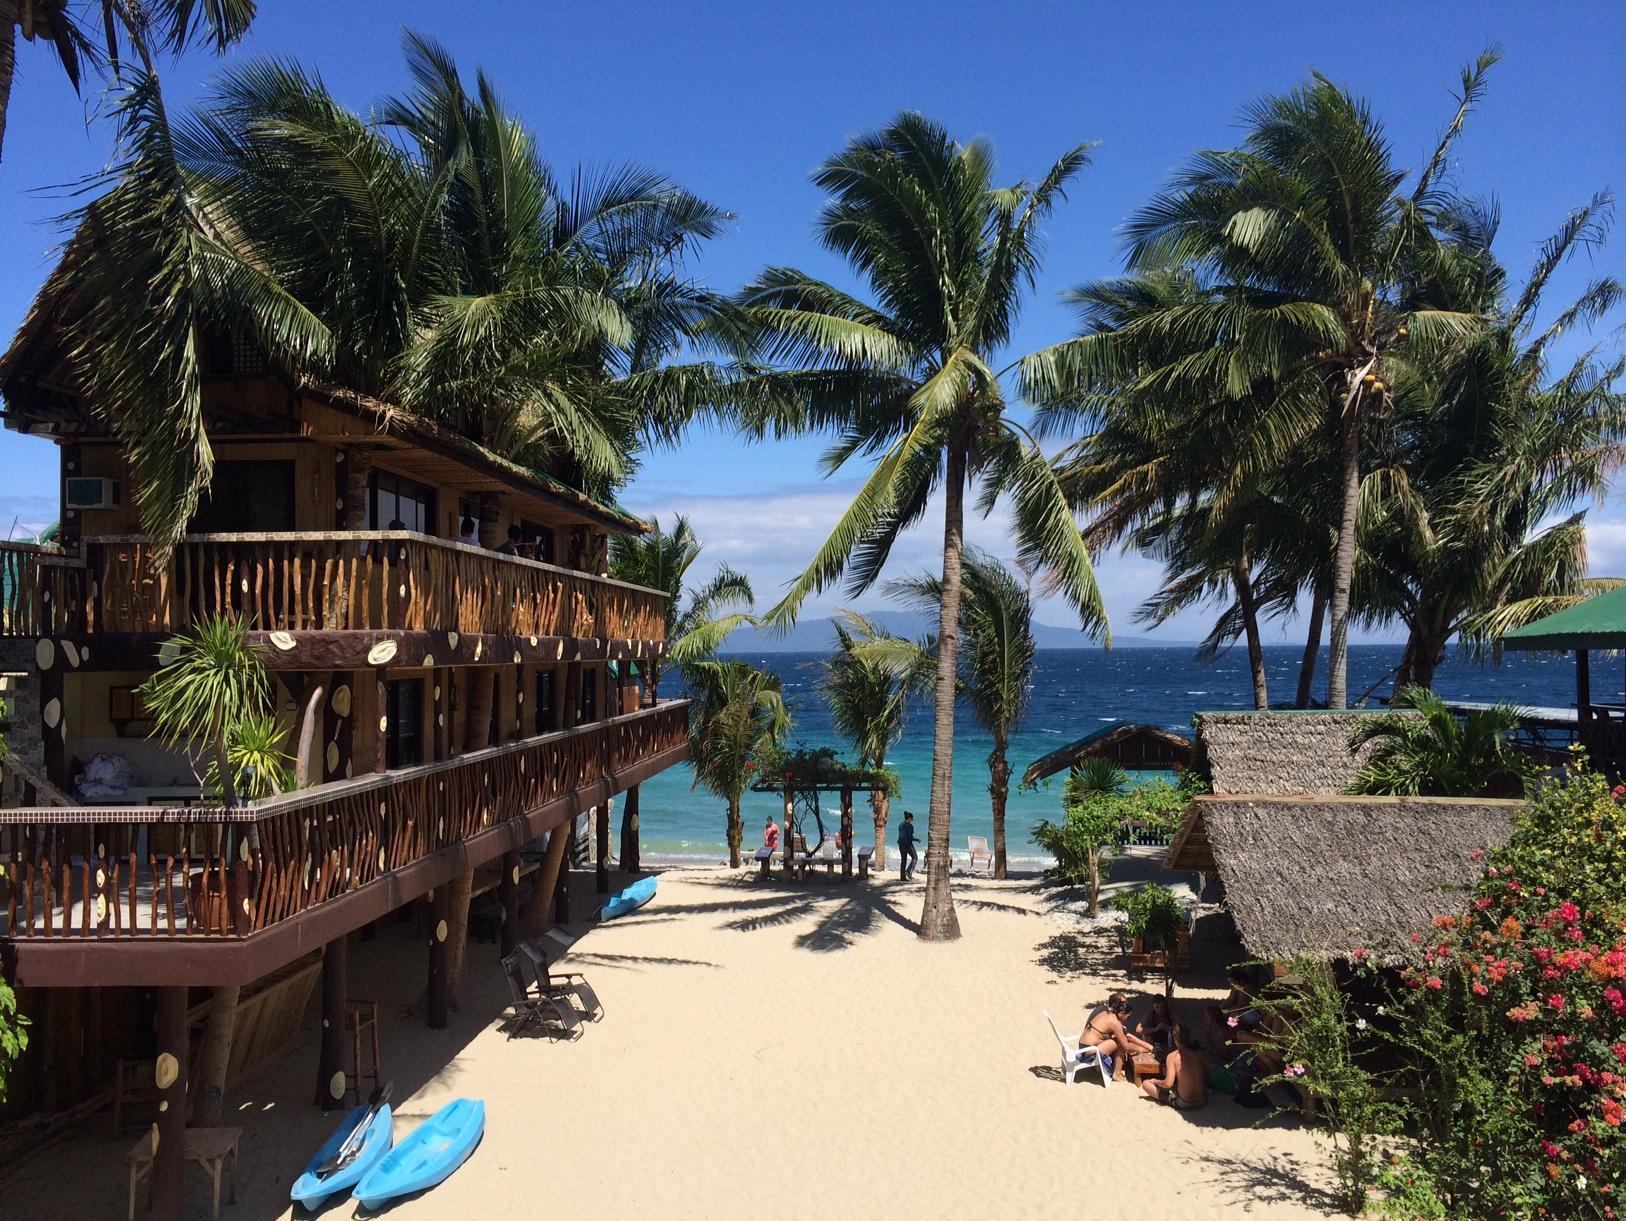 Bamboo House Beach Lodge And Restaurant